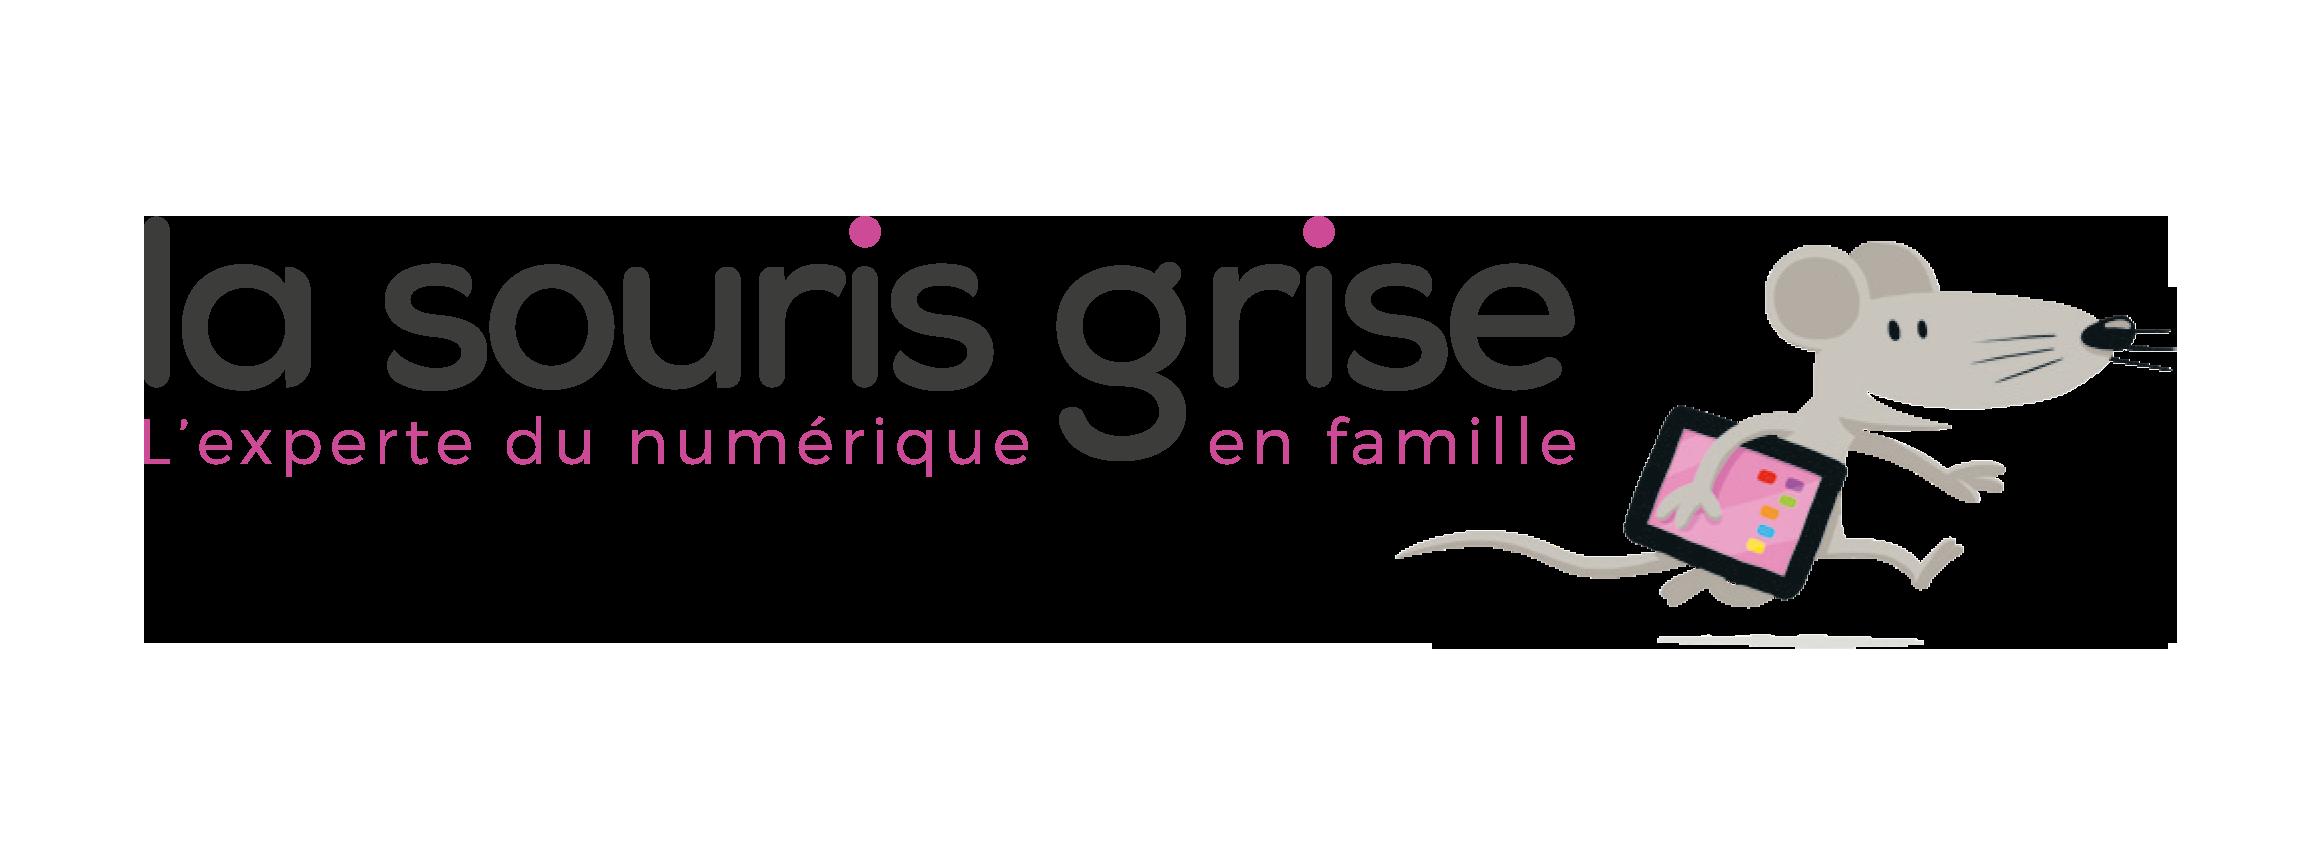 logo_sourisgrise_2019_1 (1)